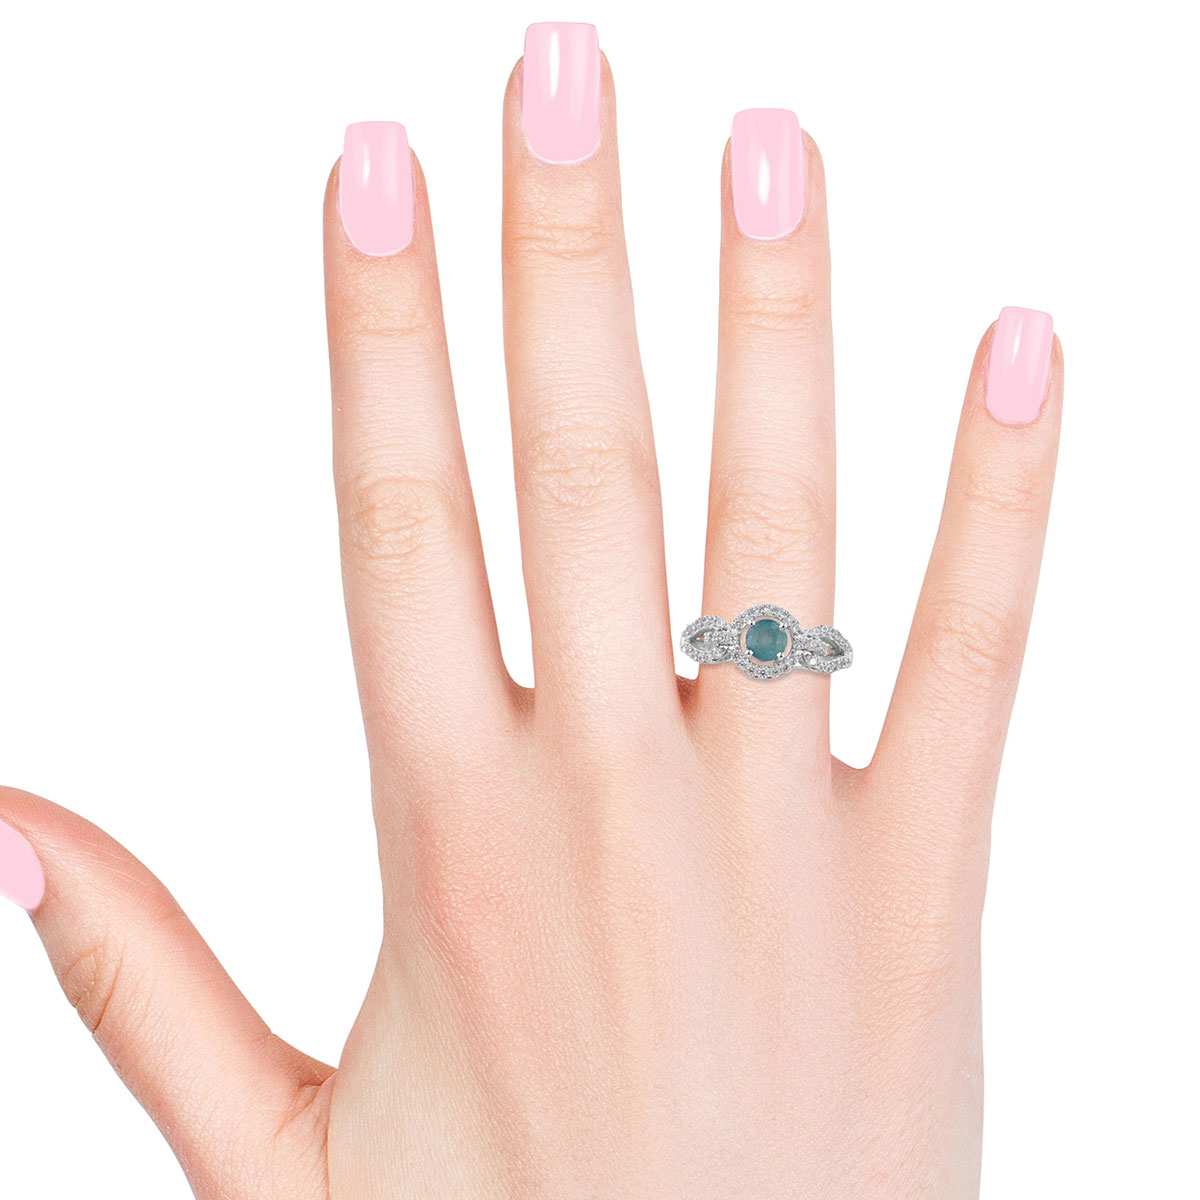 Grandidierite, Cambodian Zircon Ring in Platinum Over Sterling Silver (Size 6.0) 1.11 ctw